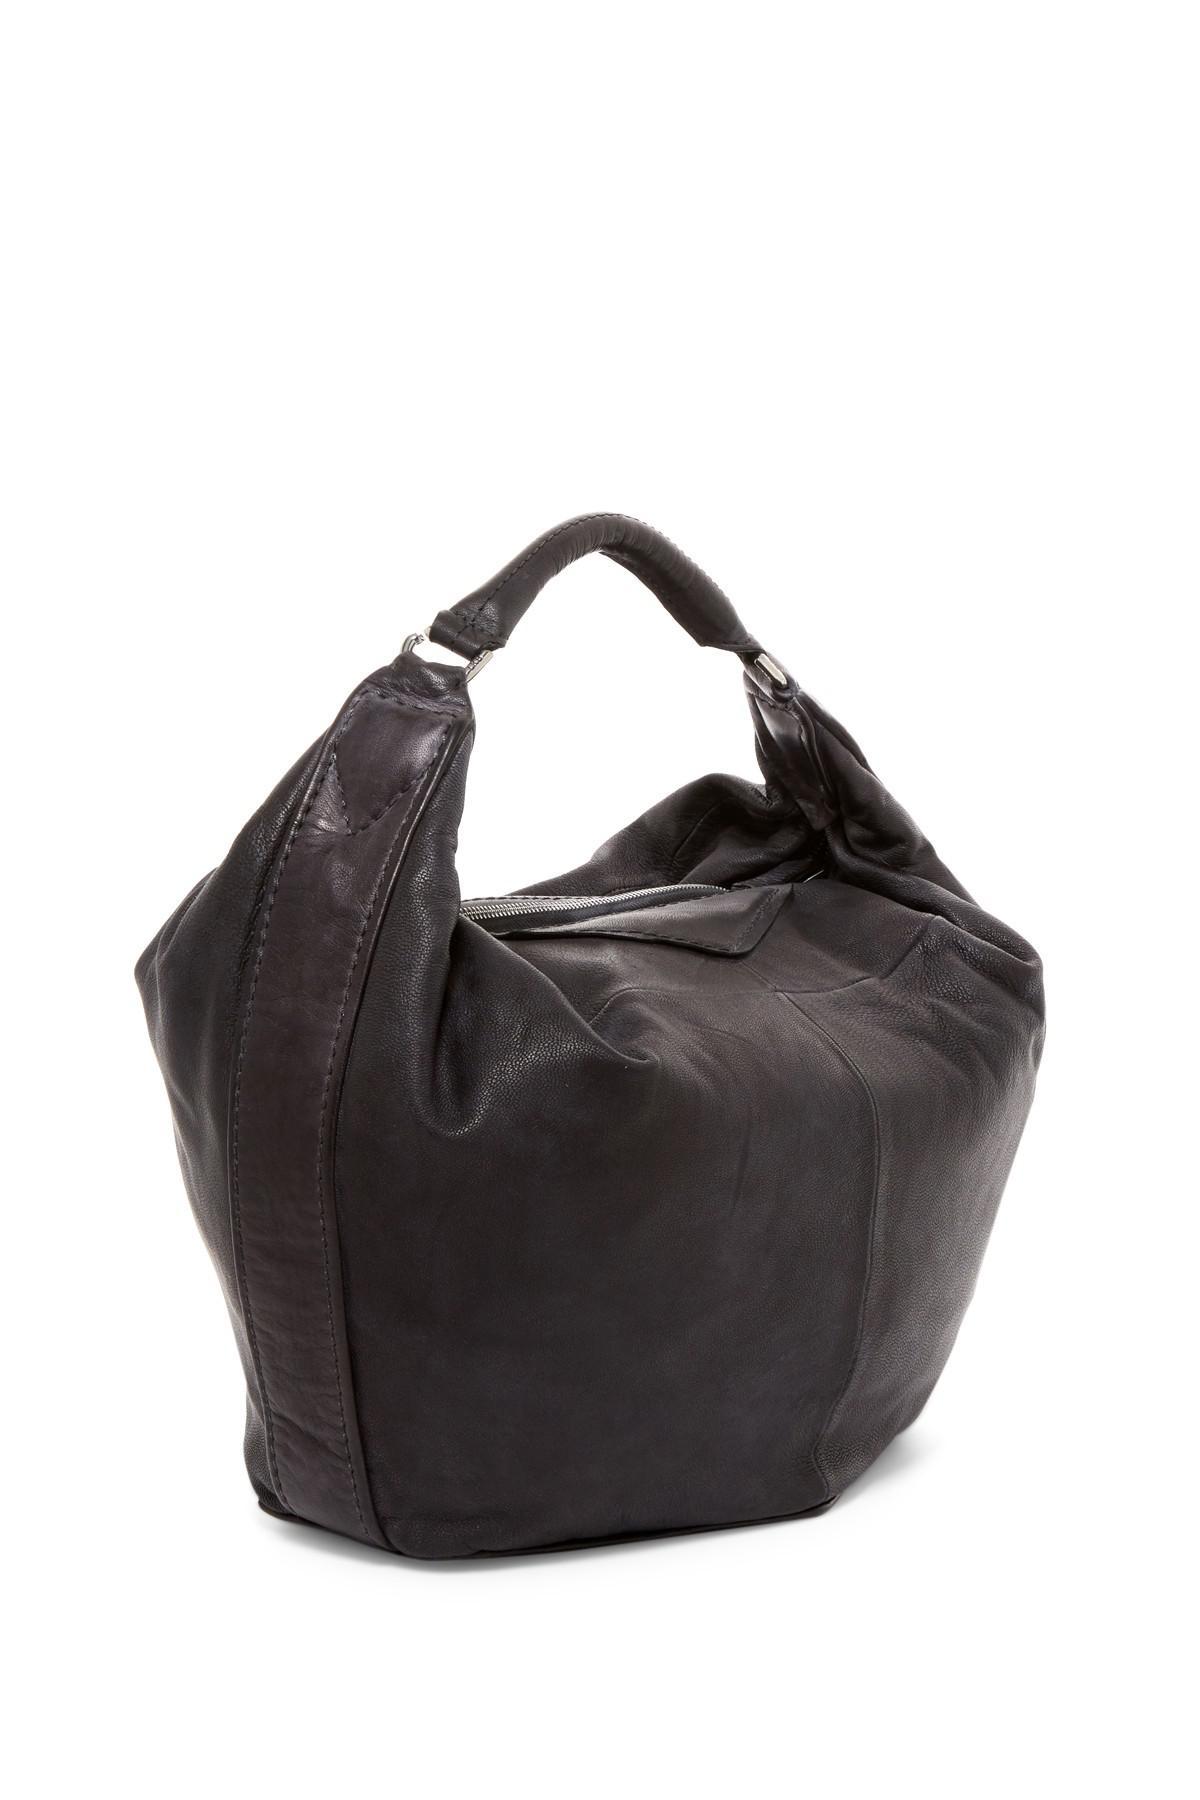 827f1f61864c Lyst - Liebeskind Berlin Tumba Washed Leather Hobo in Black